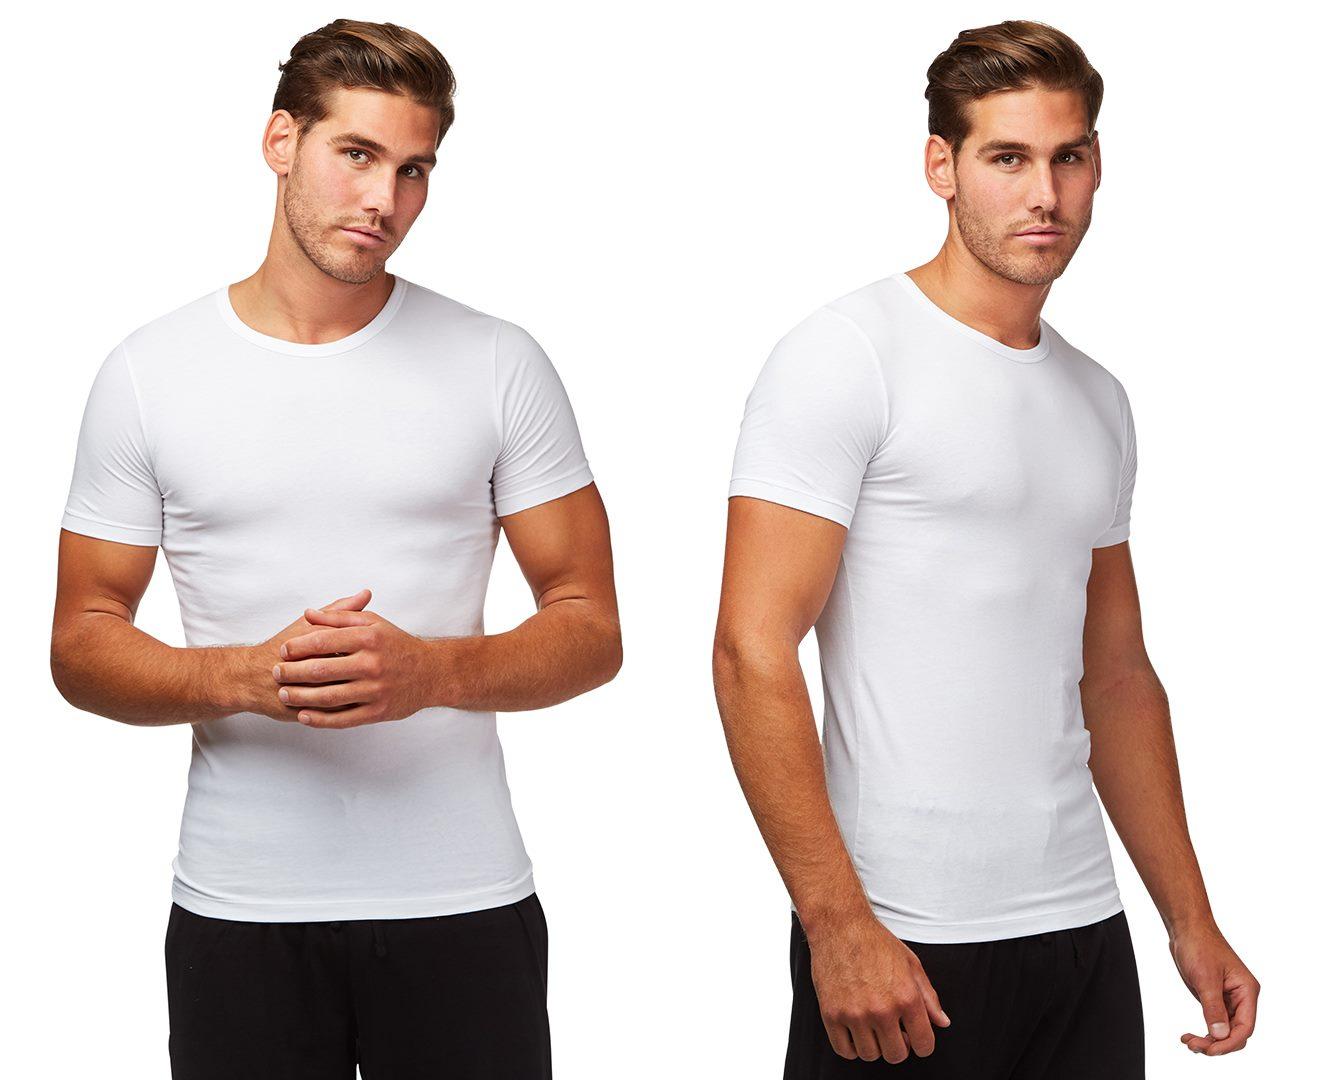 2d10a4e50 Hugo Boss Men's Round Neck Slim Fit T Shirt 2 Pack White Loungewear ...